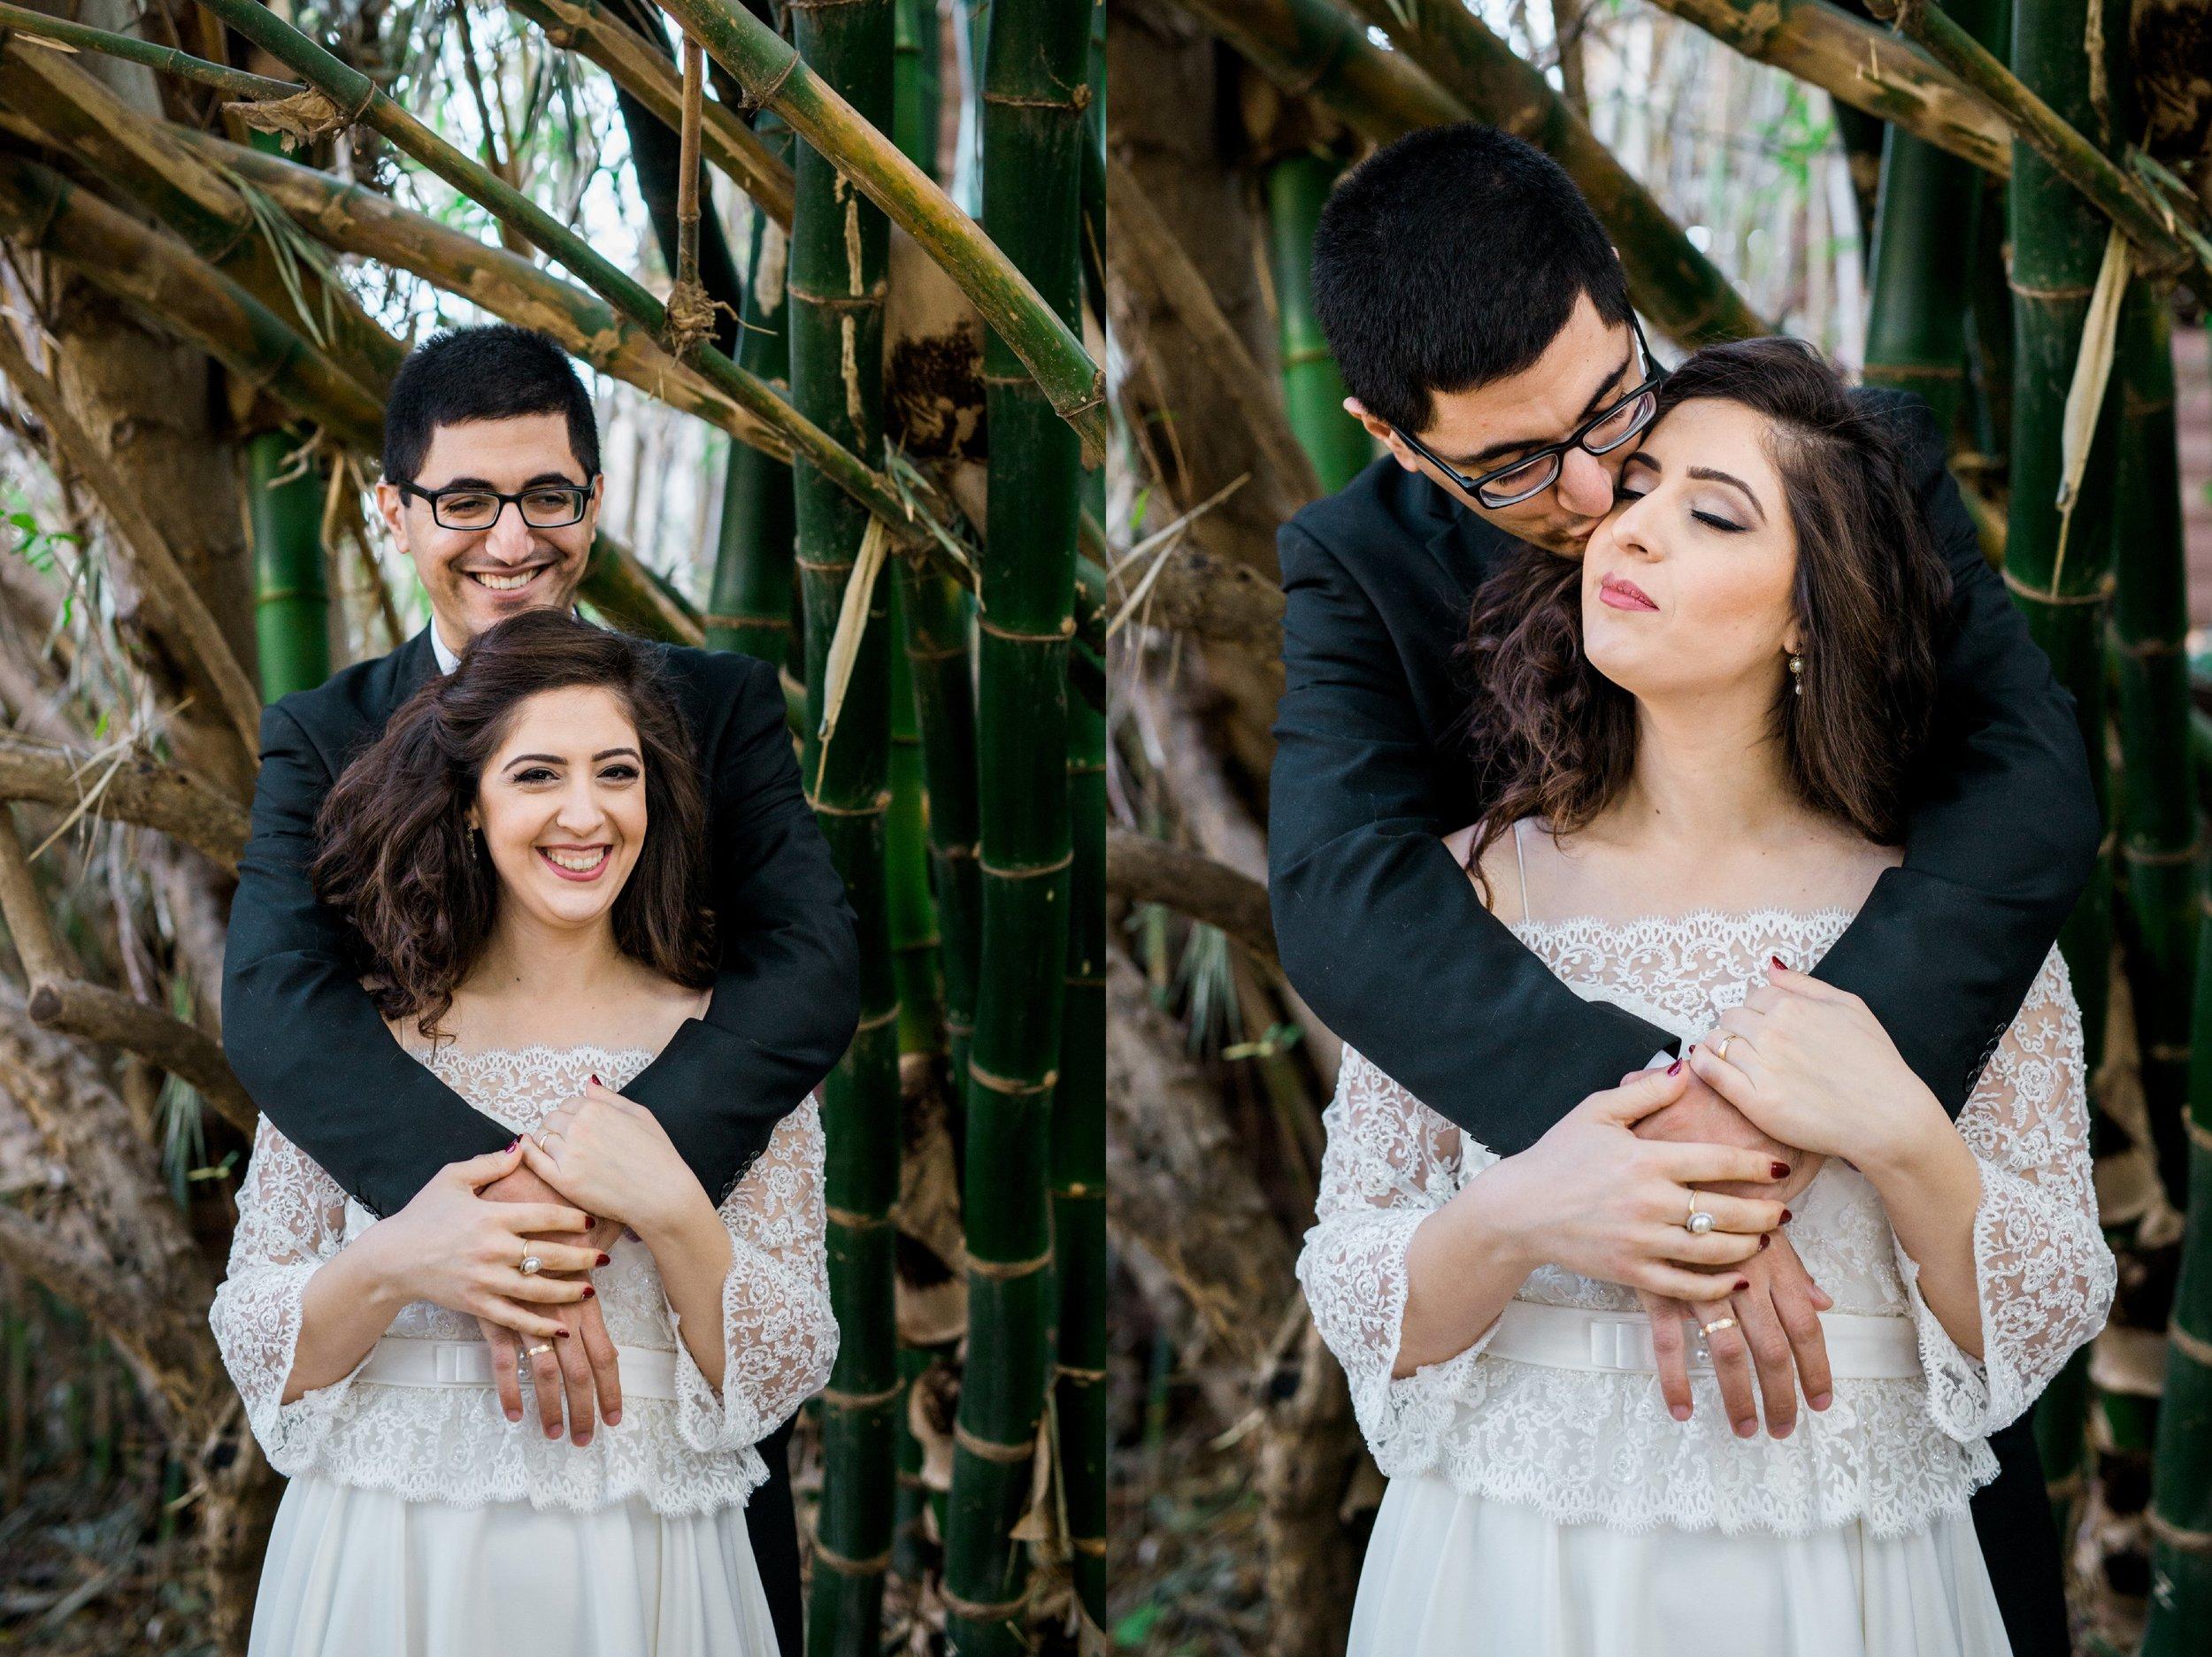 israel-garden-wedding-portraits-session-kate-giryes-photography--37_WEB.jpg